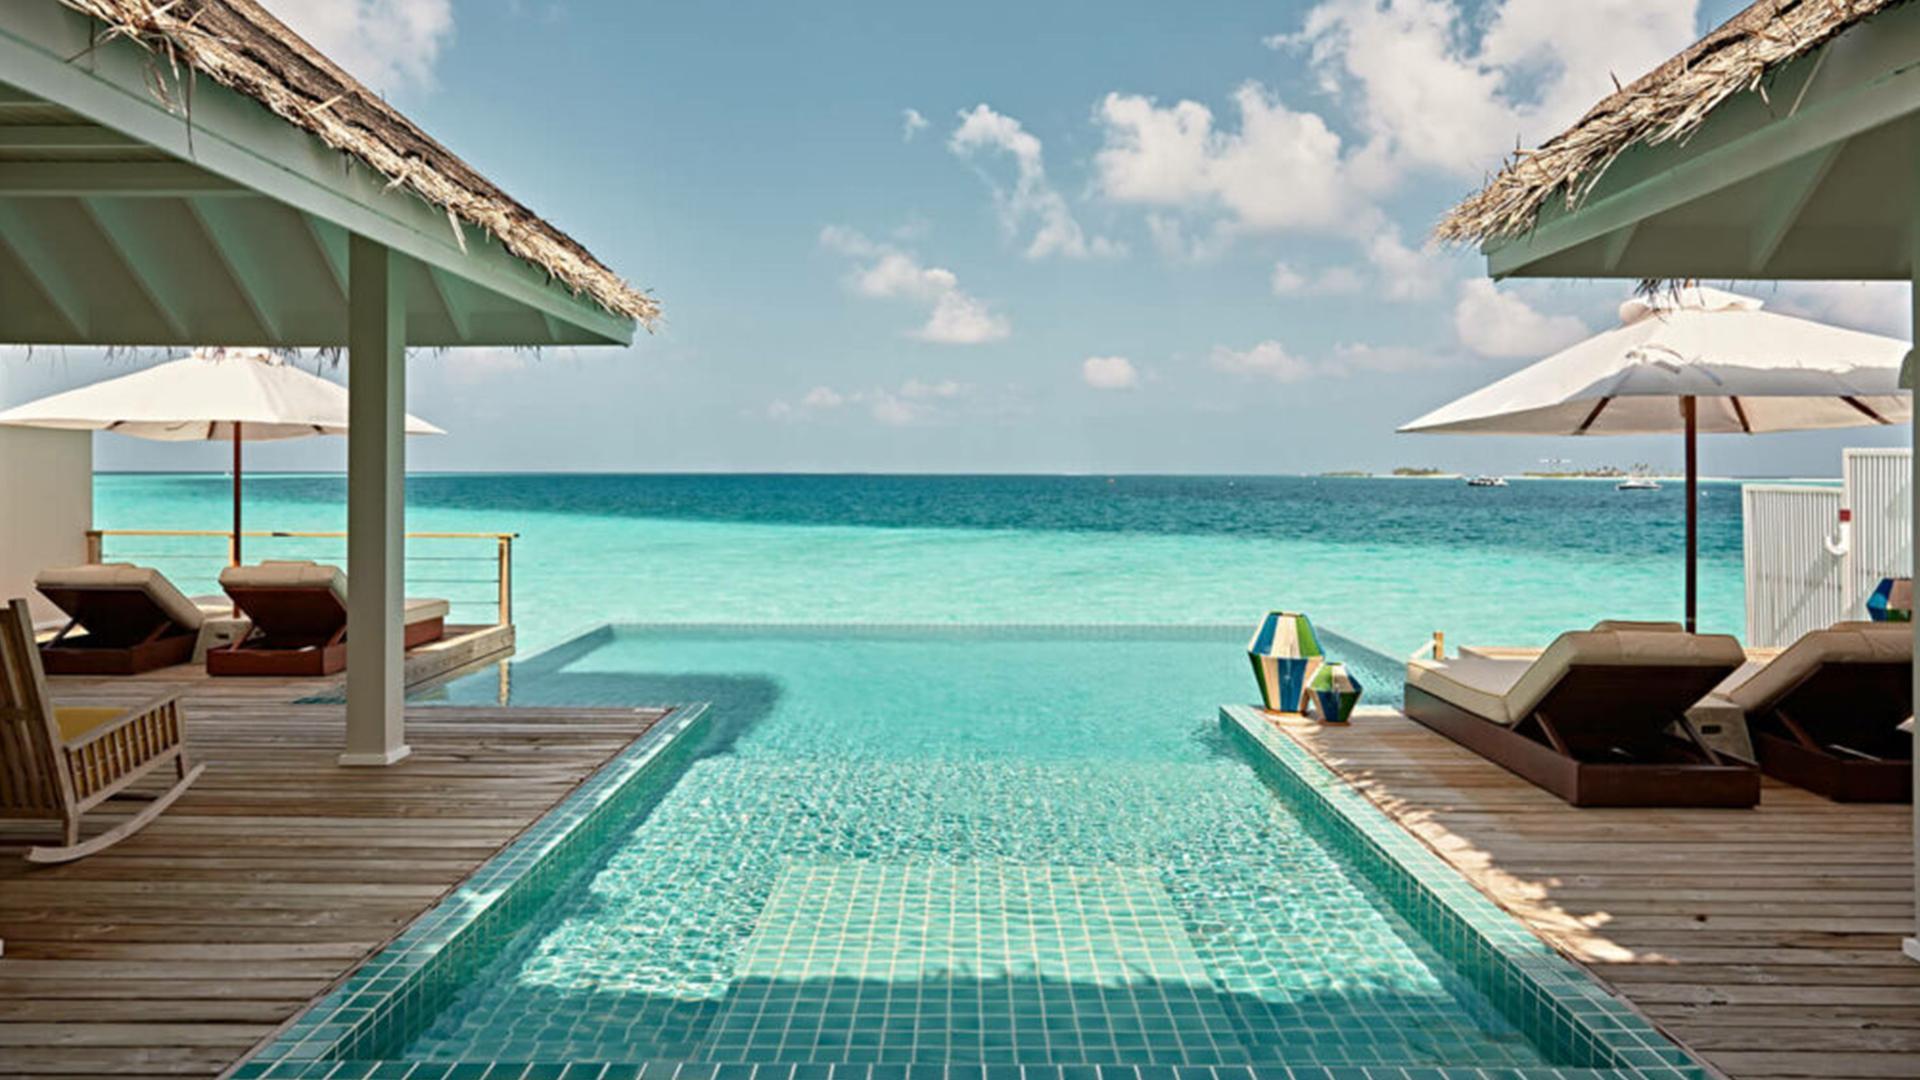 Two-Bedroom Water Villa with Pool image 1 at Seaside Finolhu Maldives by Baa Atoll, North Province, Maldives